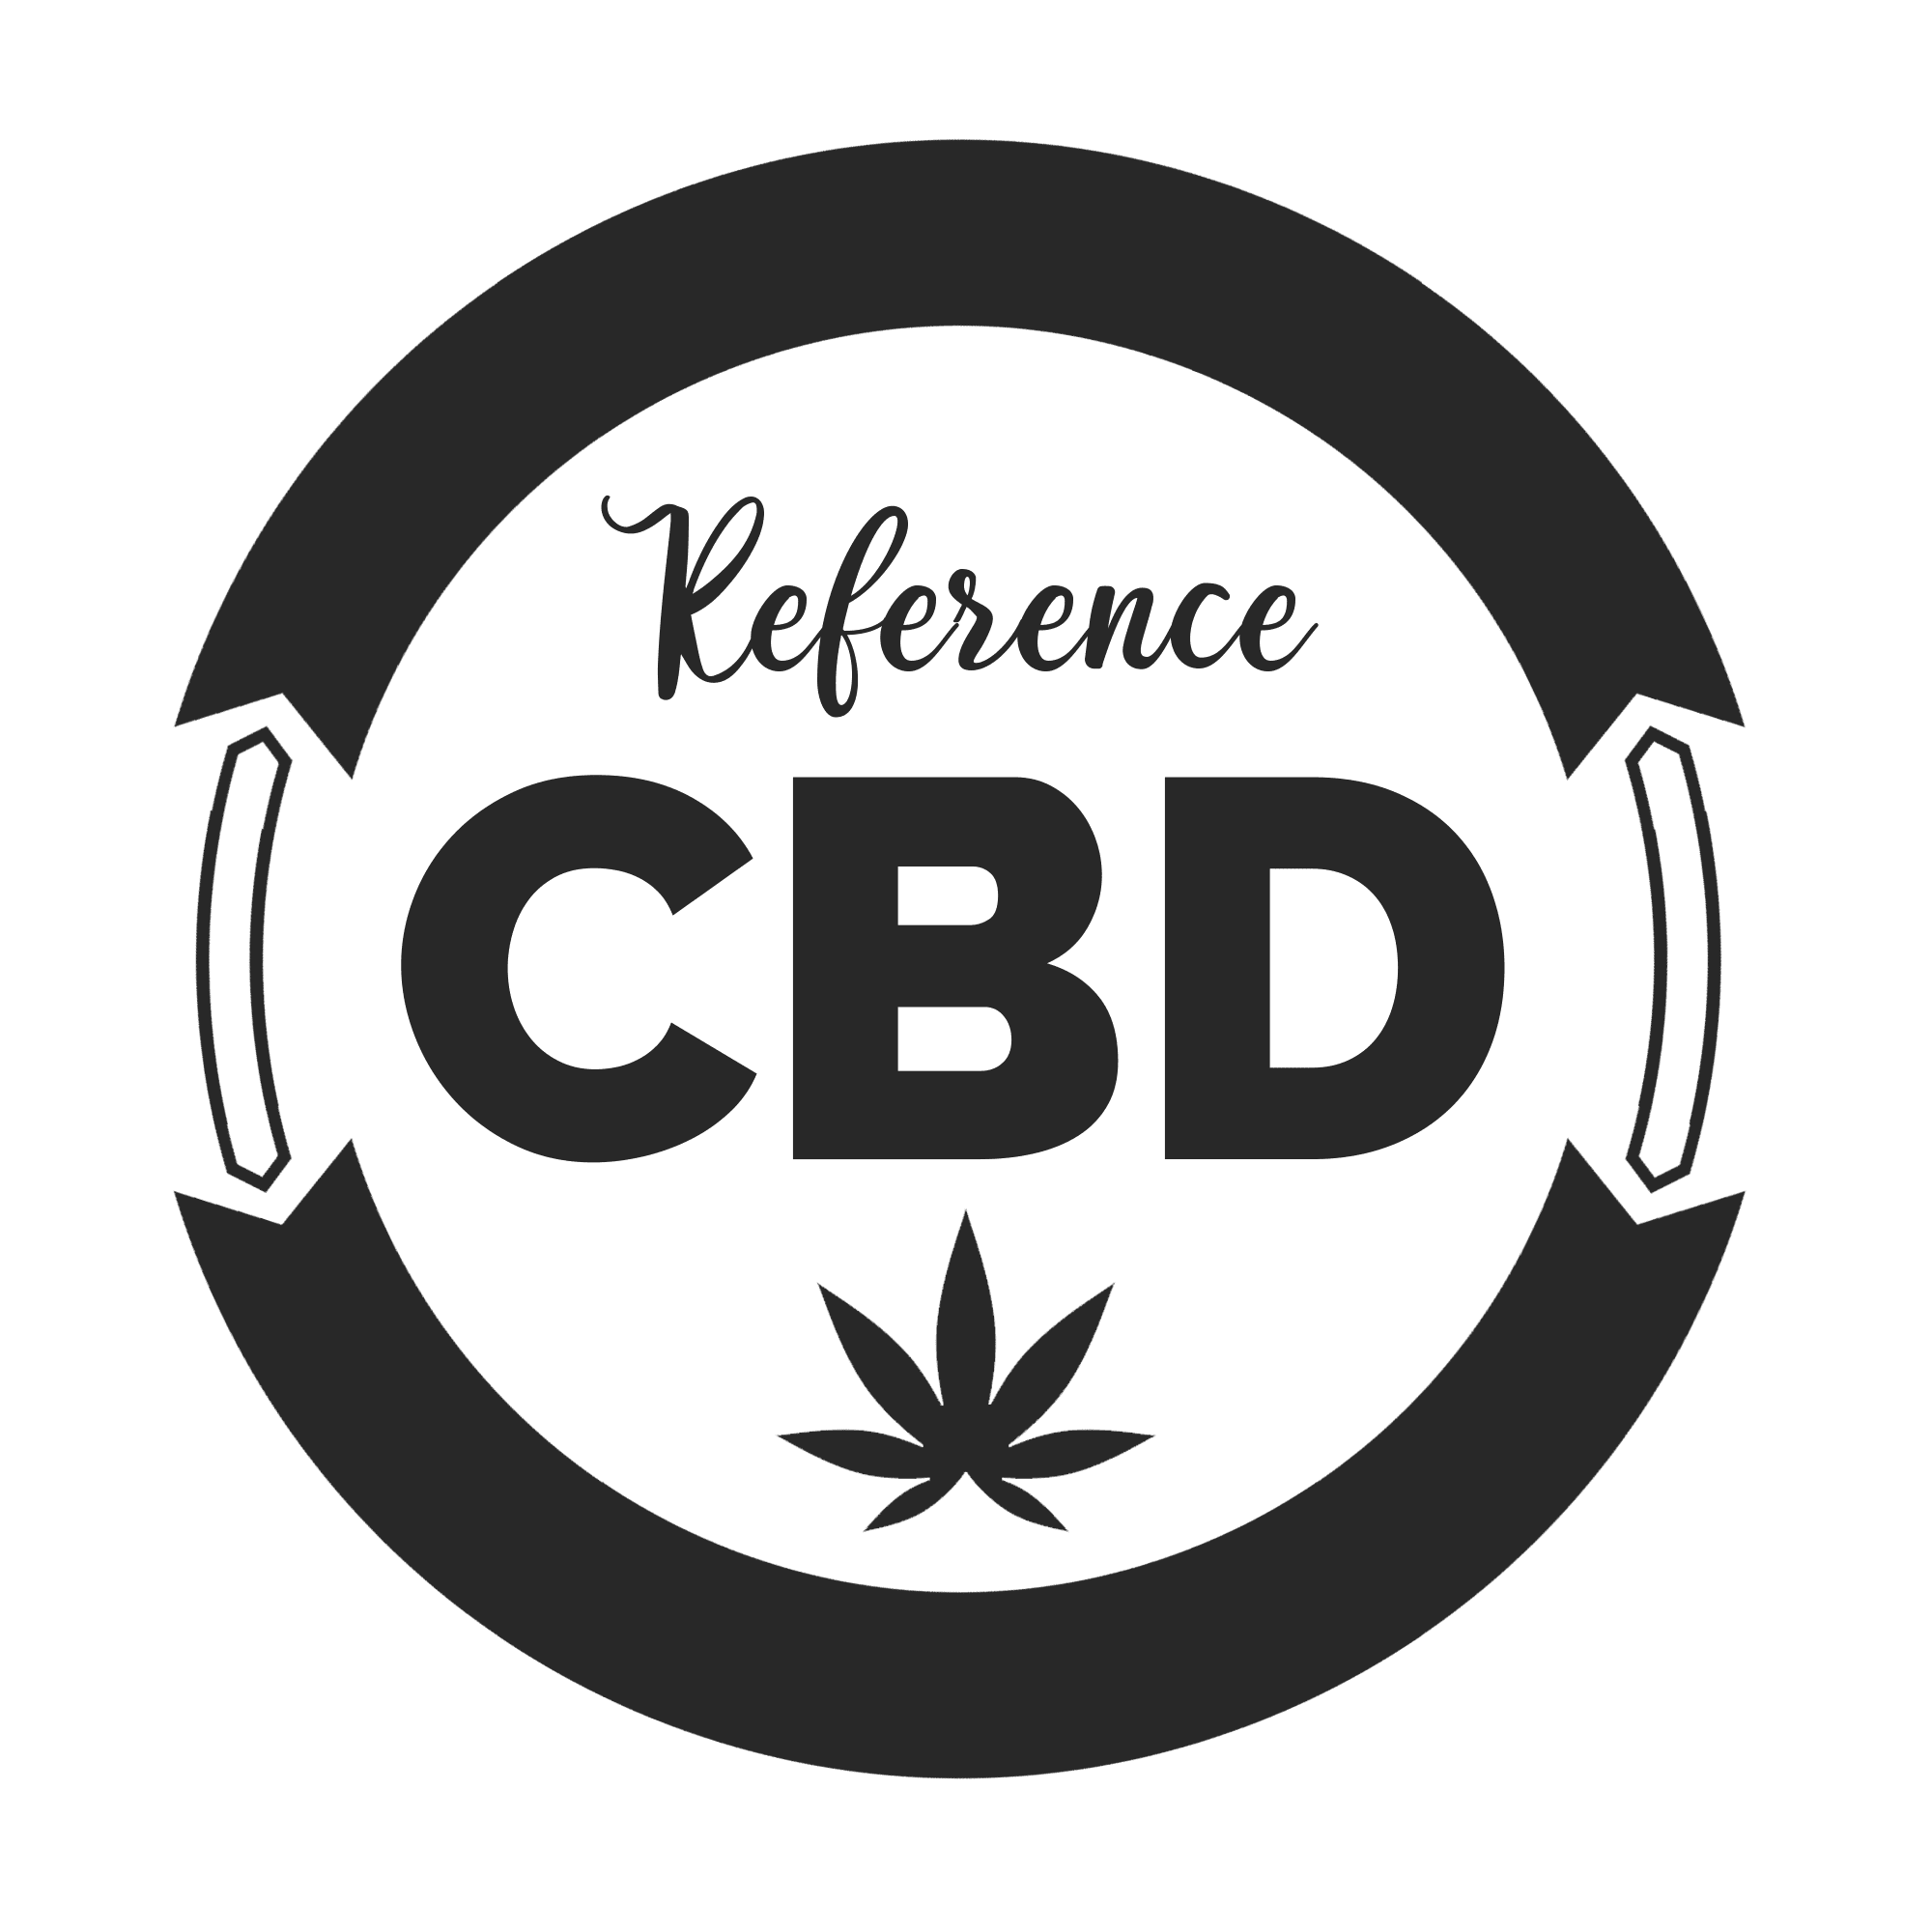 Reference-cbd